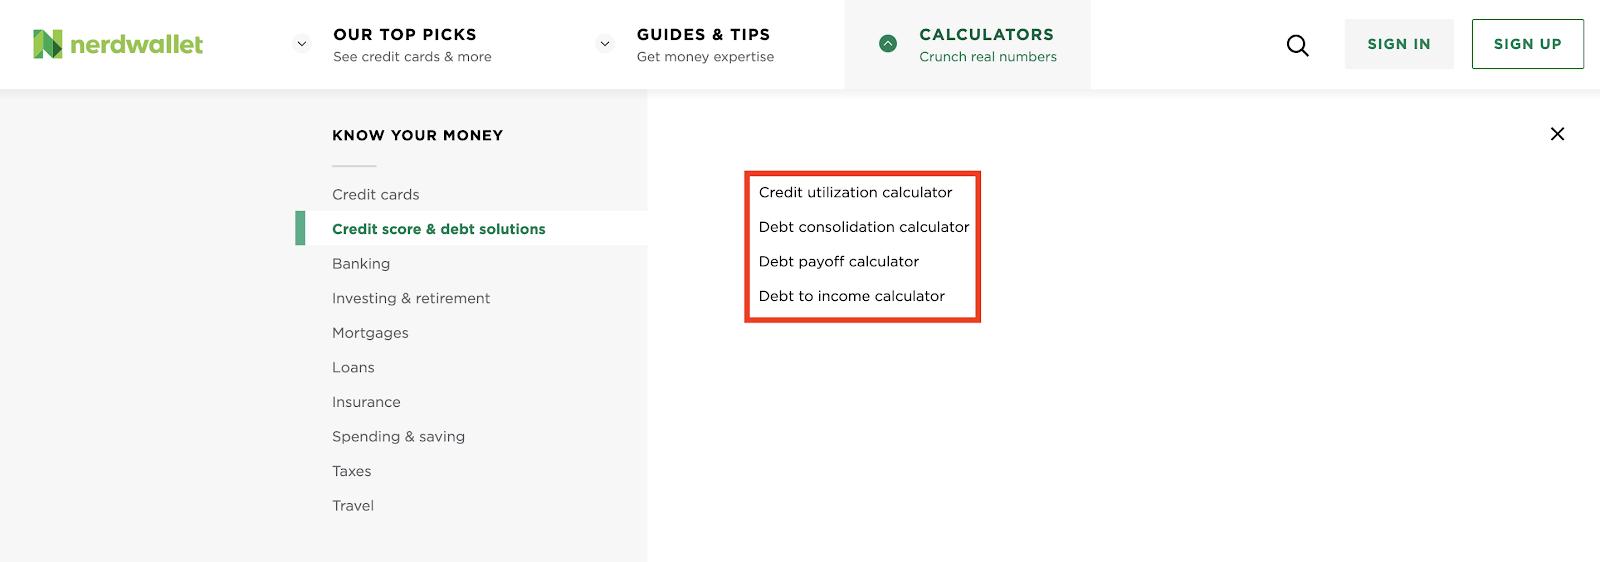 Nerdwallet credit score features